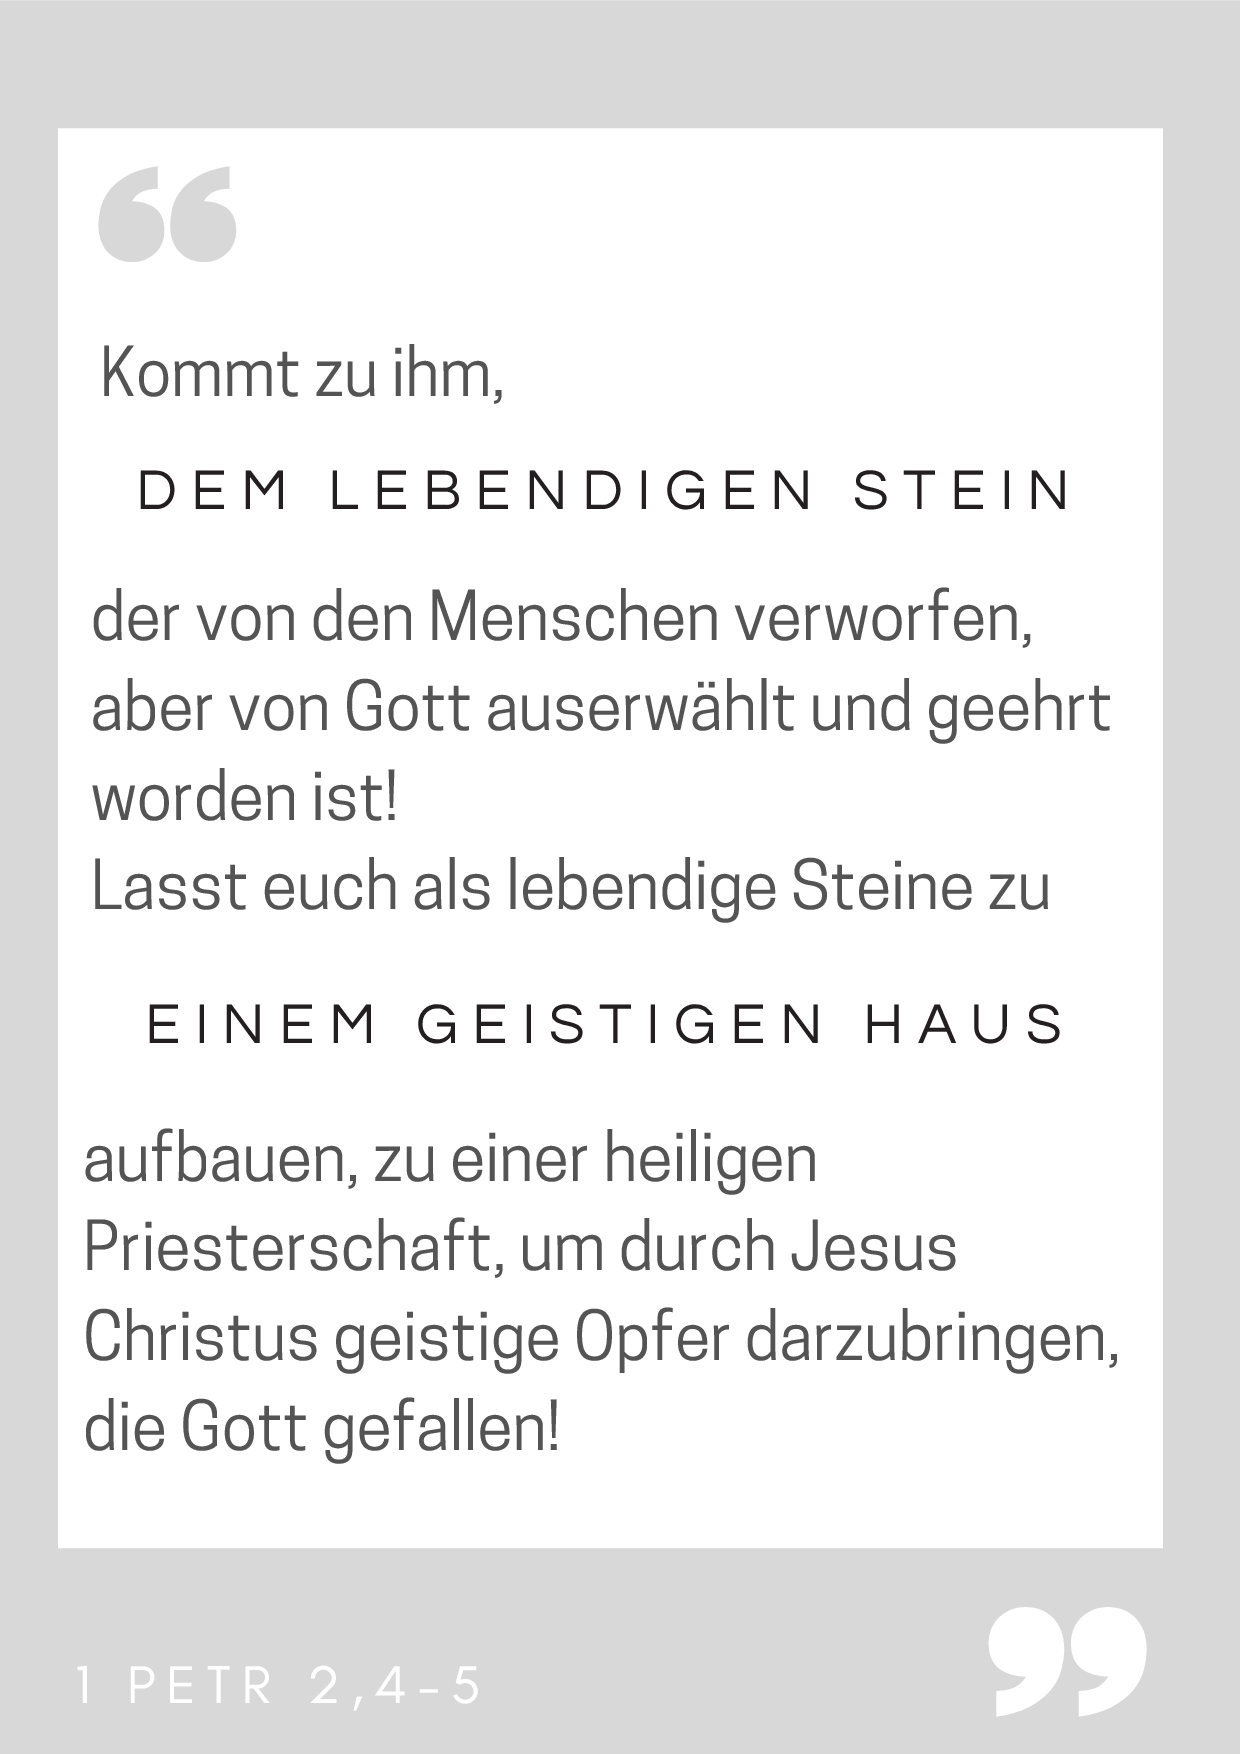 2020 10 17 Wittibreut Gnadenbrunnen Impuls 001